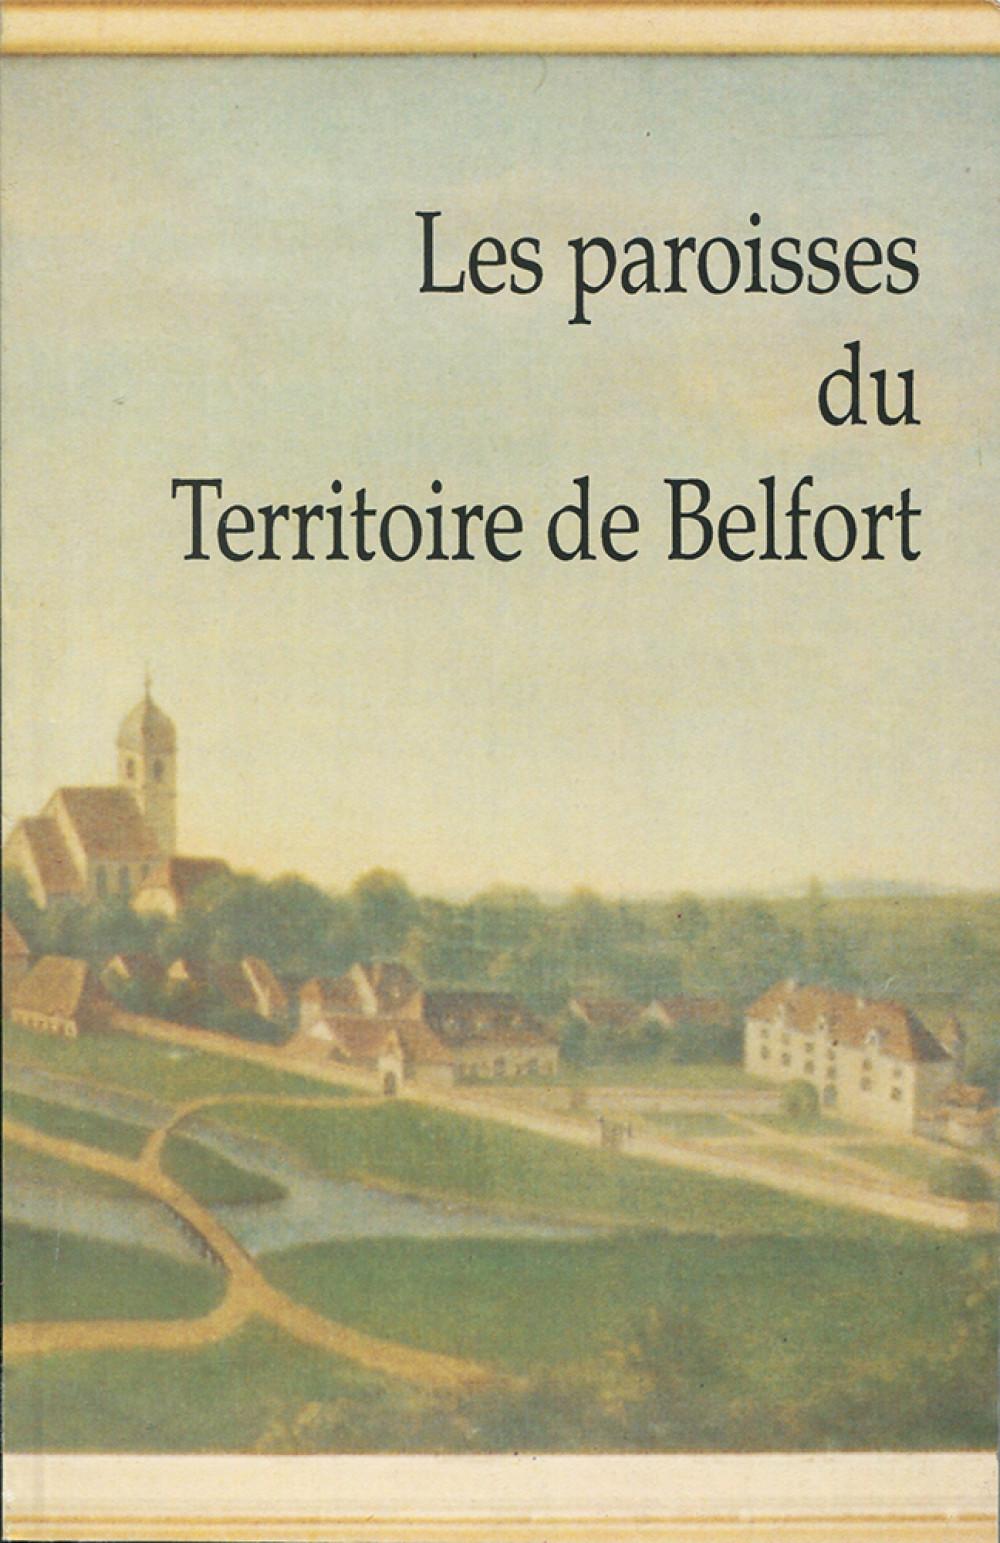 Les paroisses du territoire de Belfort